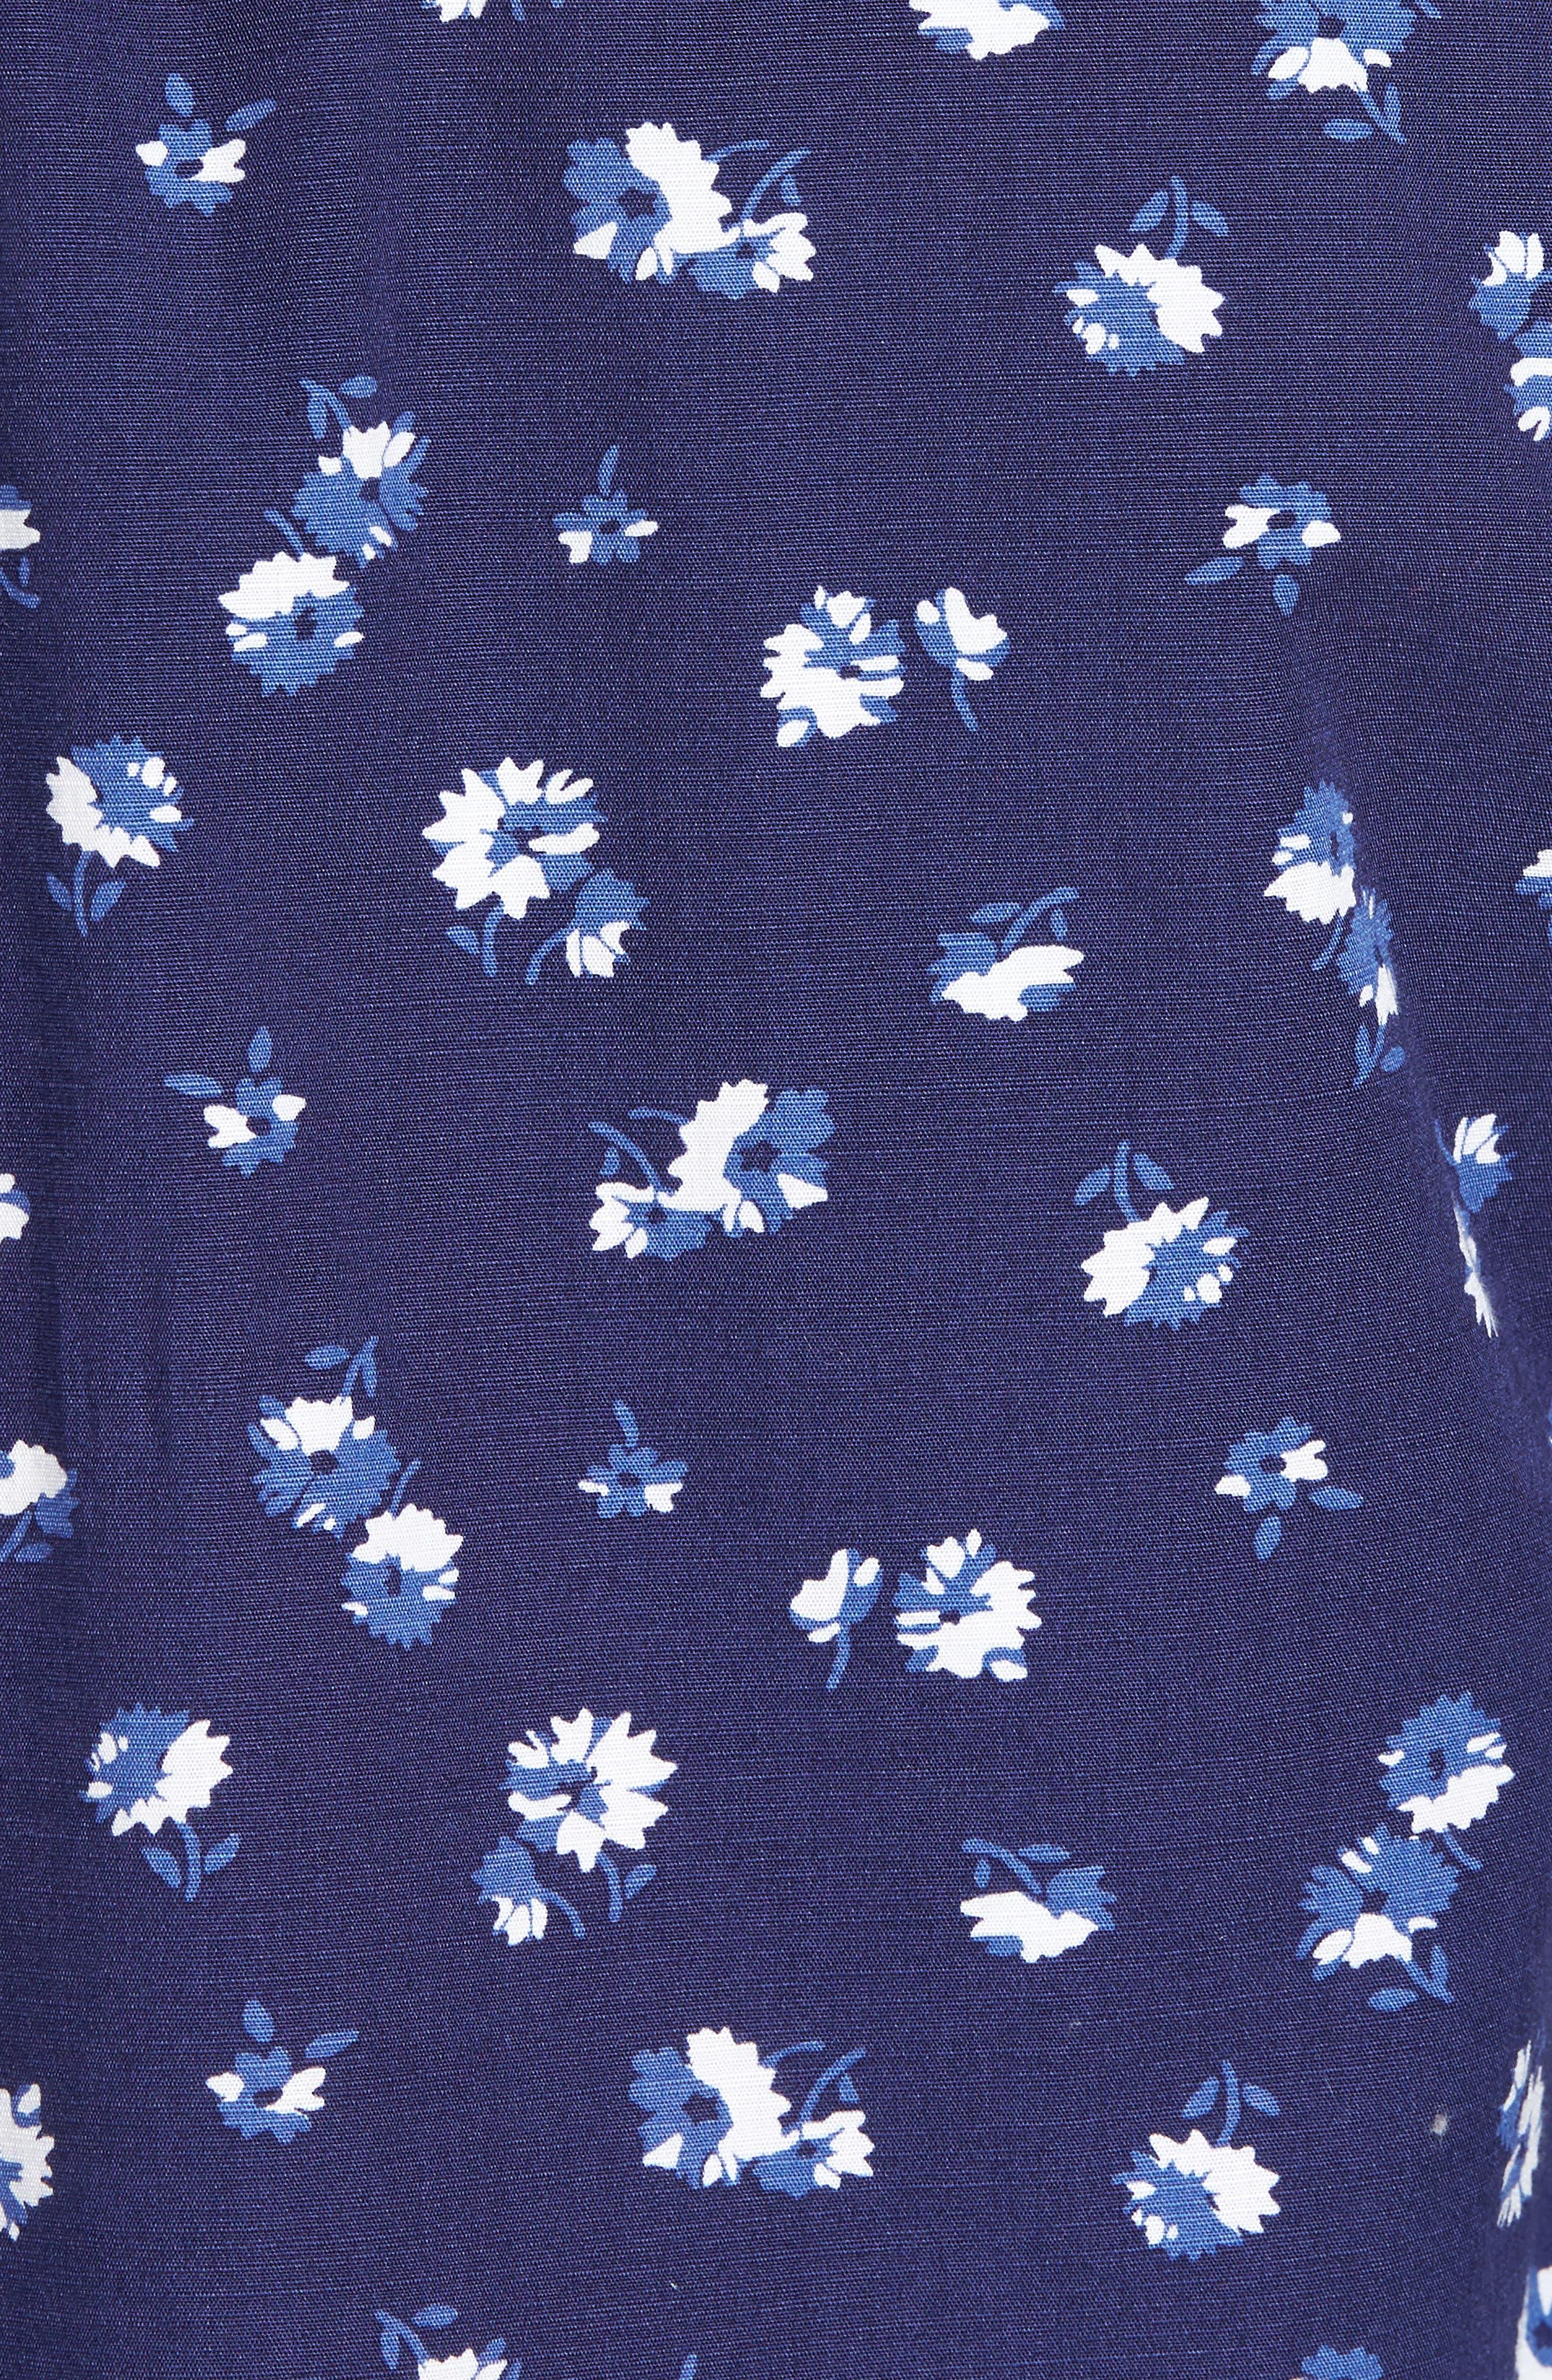 Trim Fit Floral Sport Shirt,                             Alternate thumbnail 7, color,                             Navy Iris Aster Flowers